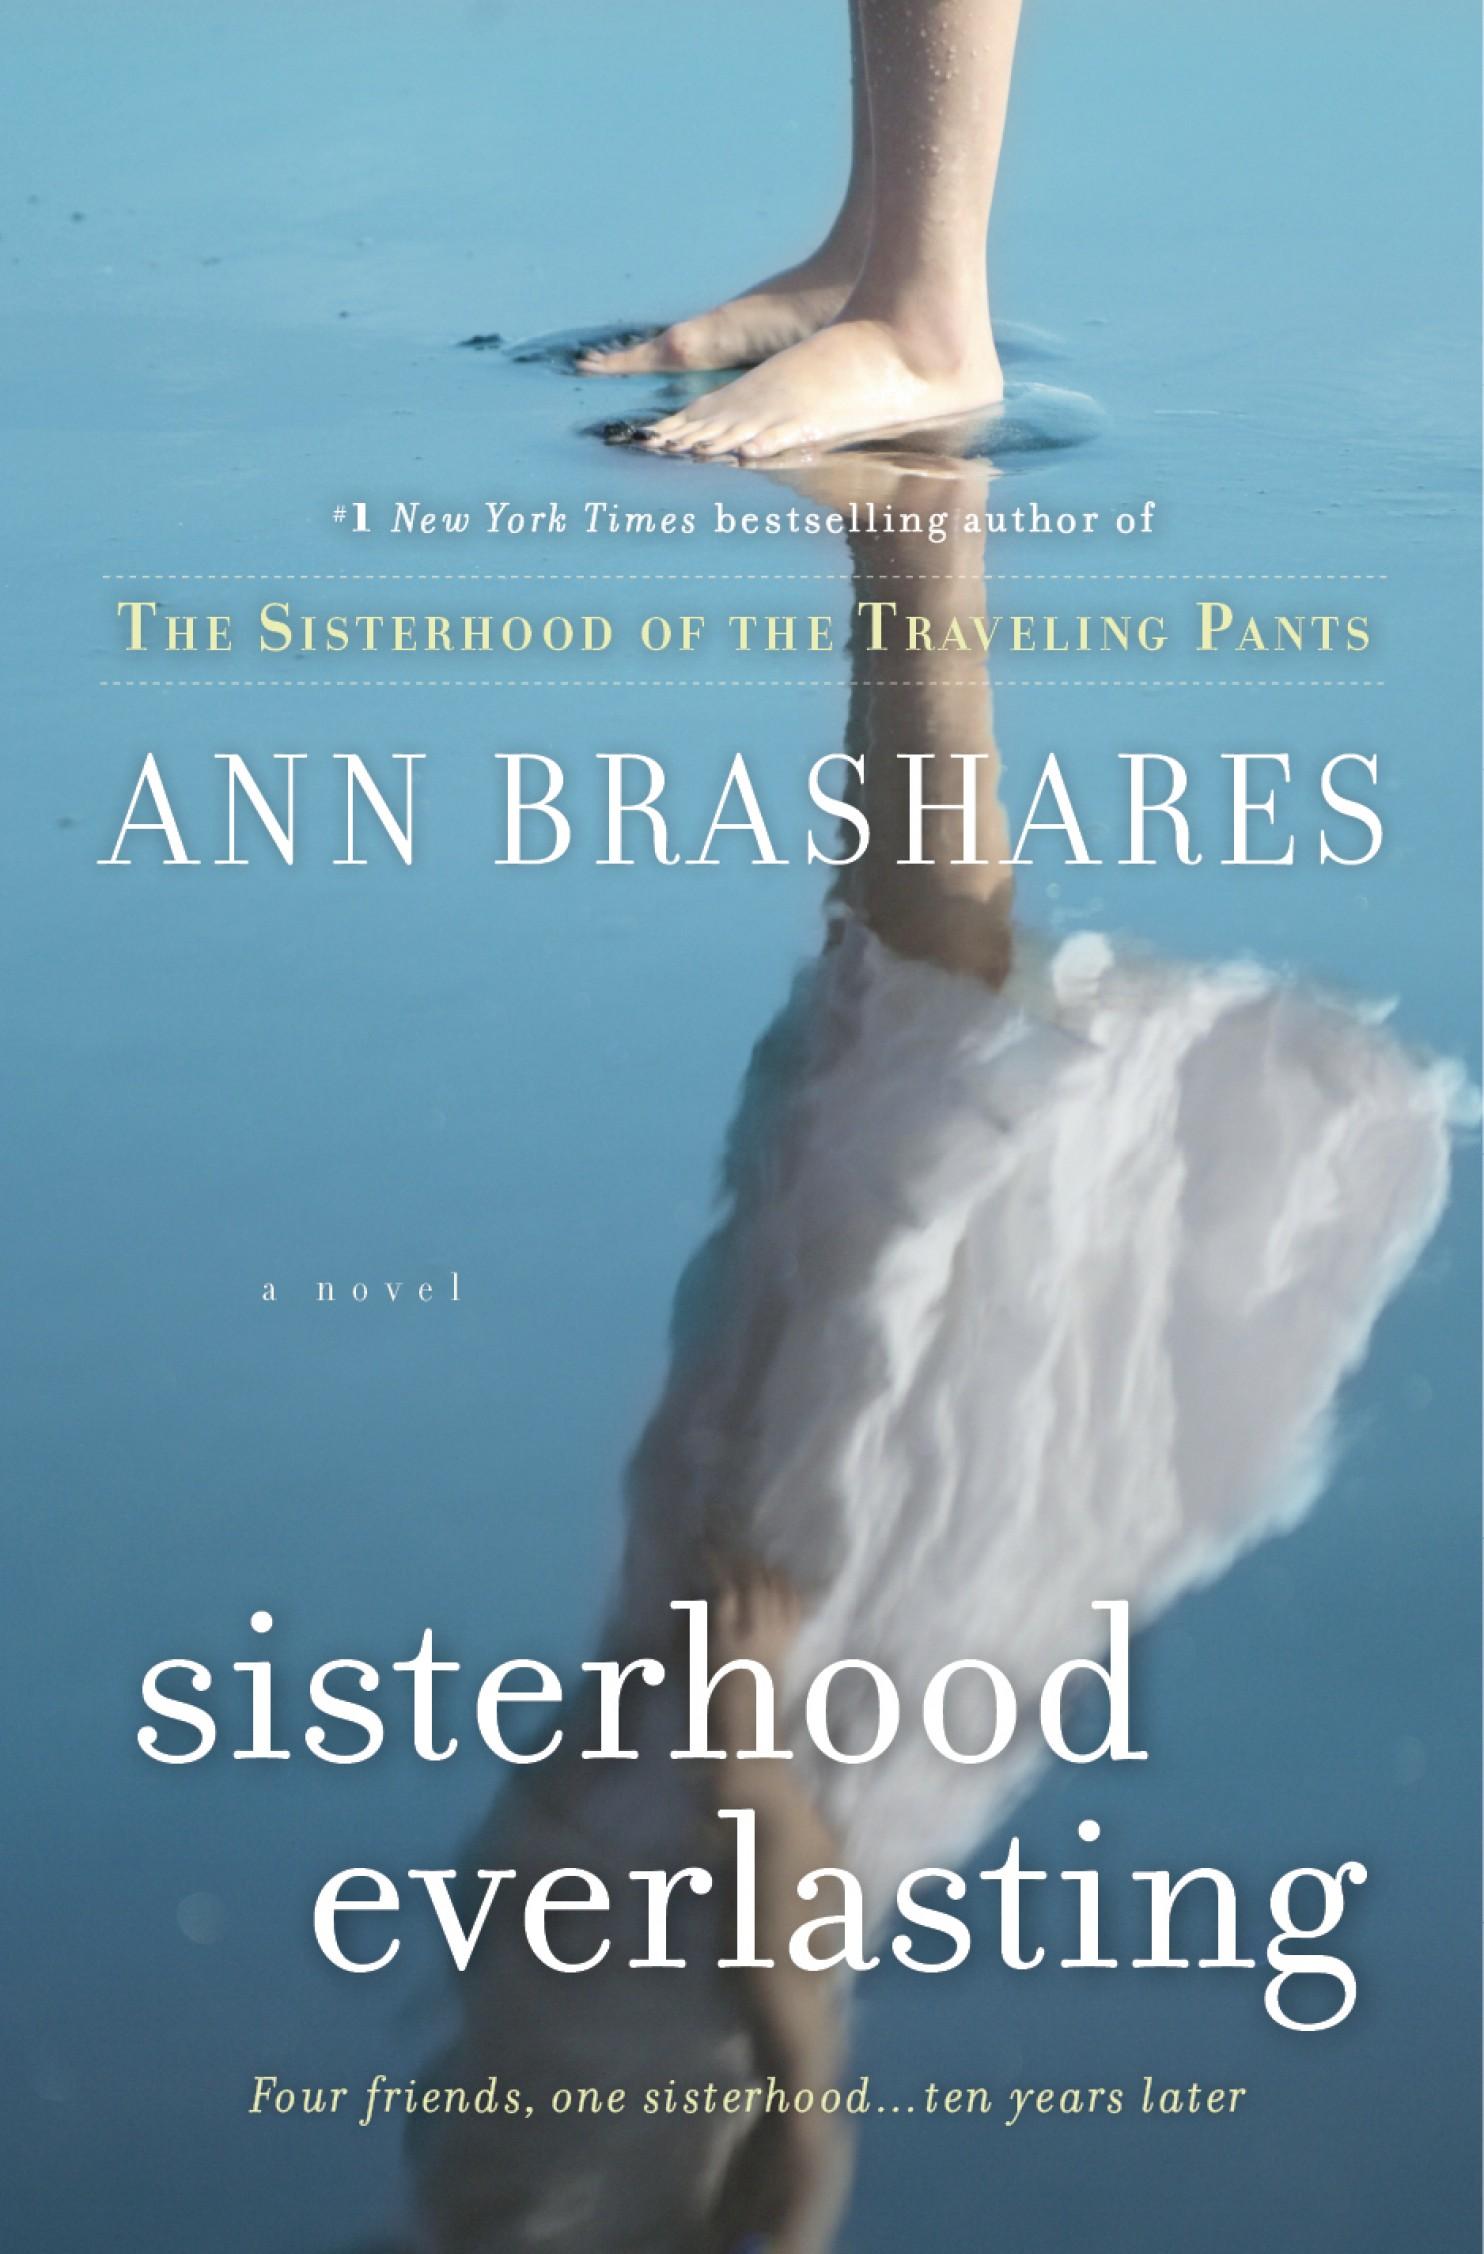 sisterhood-everlasting-cover